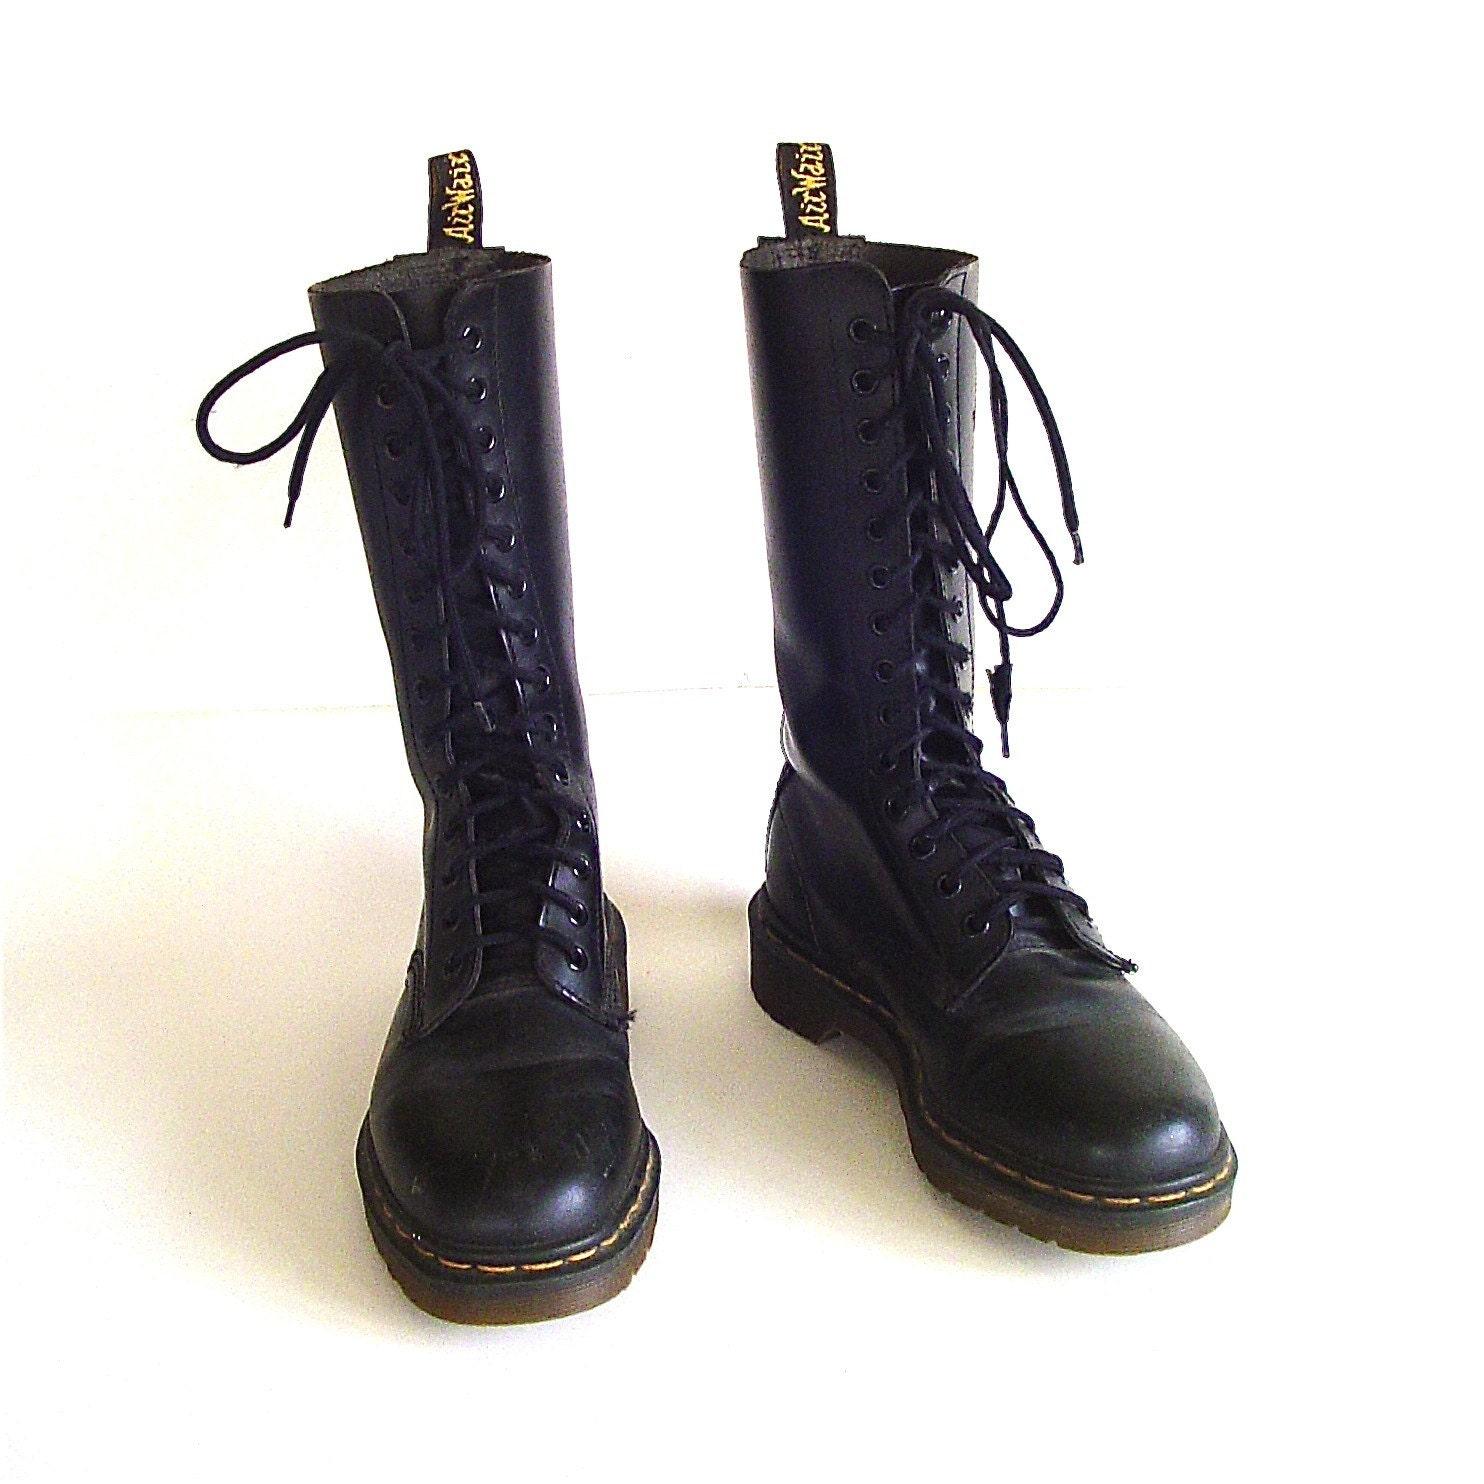 vintage doc martens black leather combat boots by